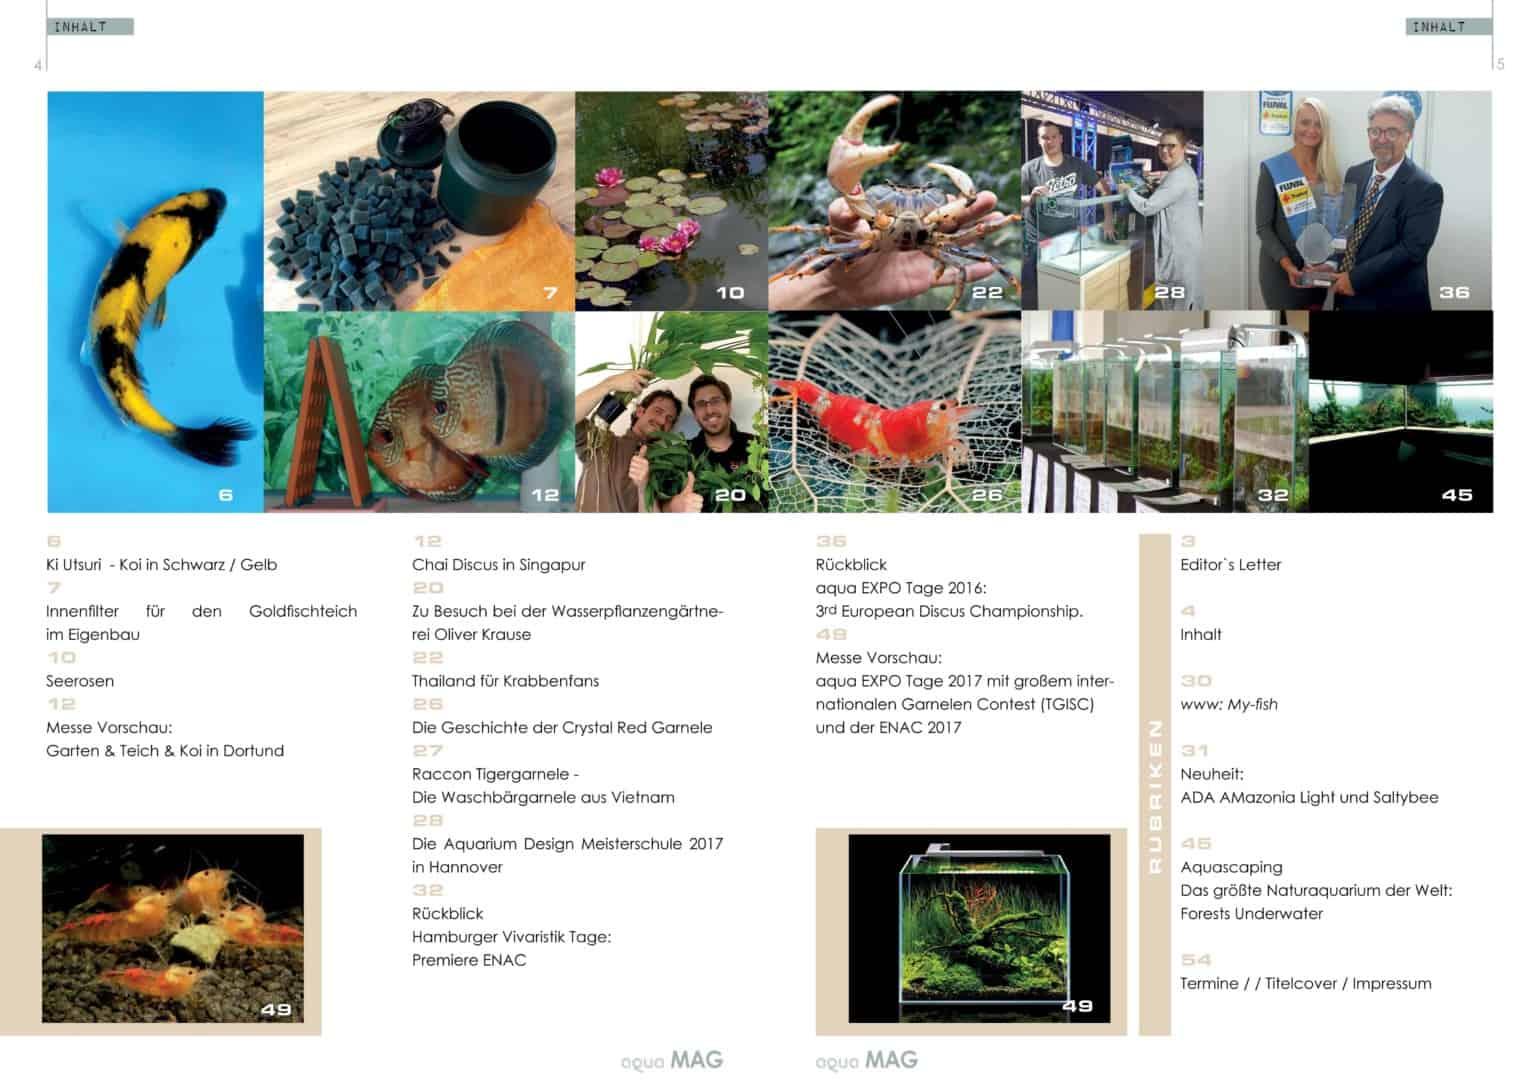 aqua MAG No 3 ist erschienen - Das Indoor und Outdoor Aquaristik MAGazin 2